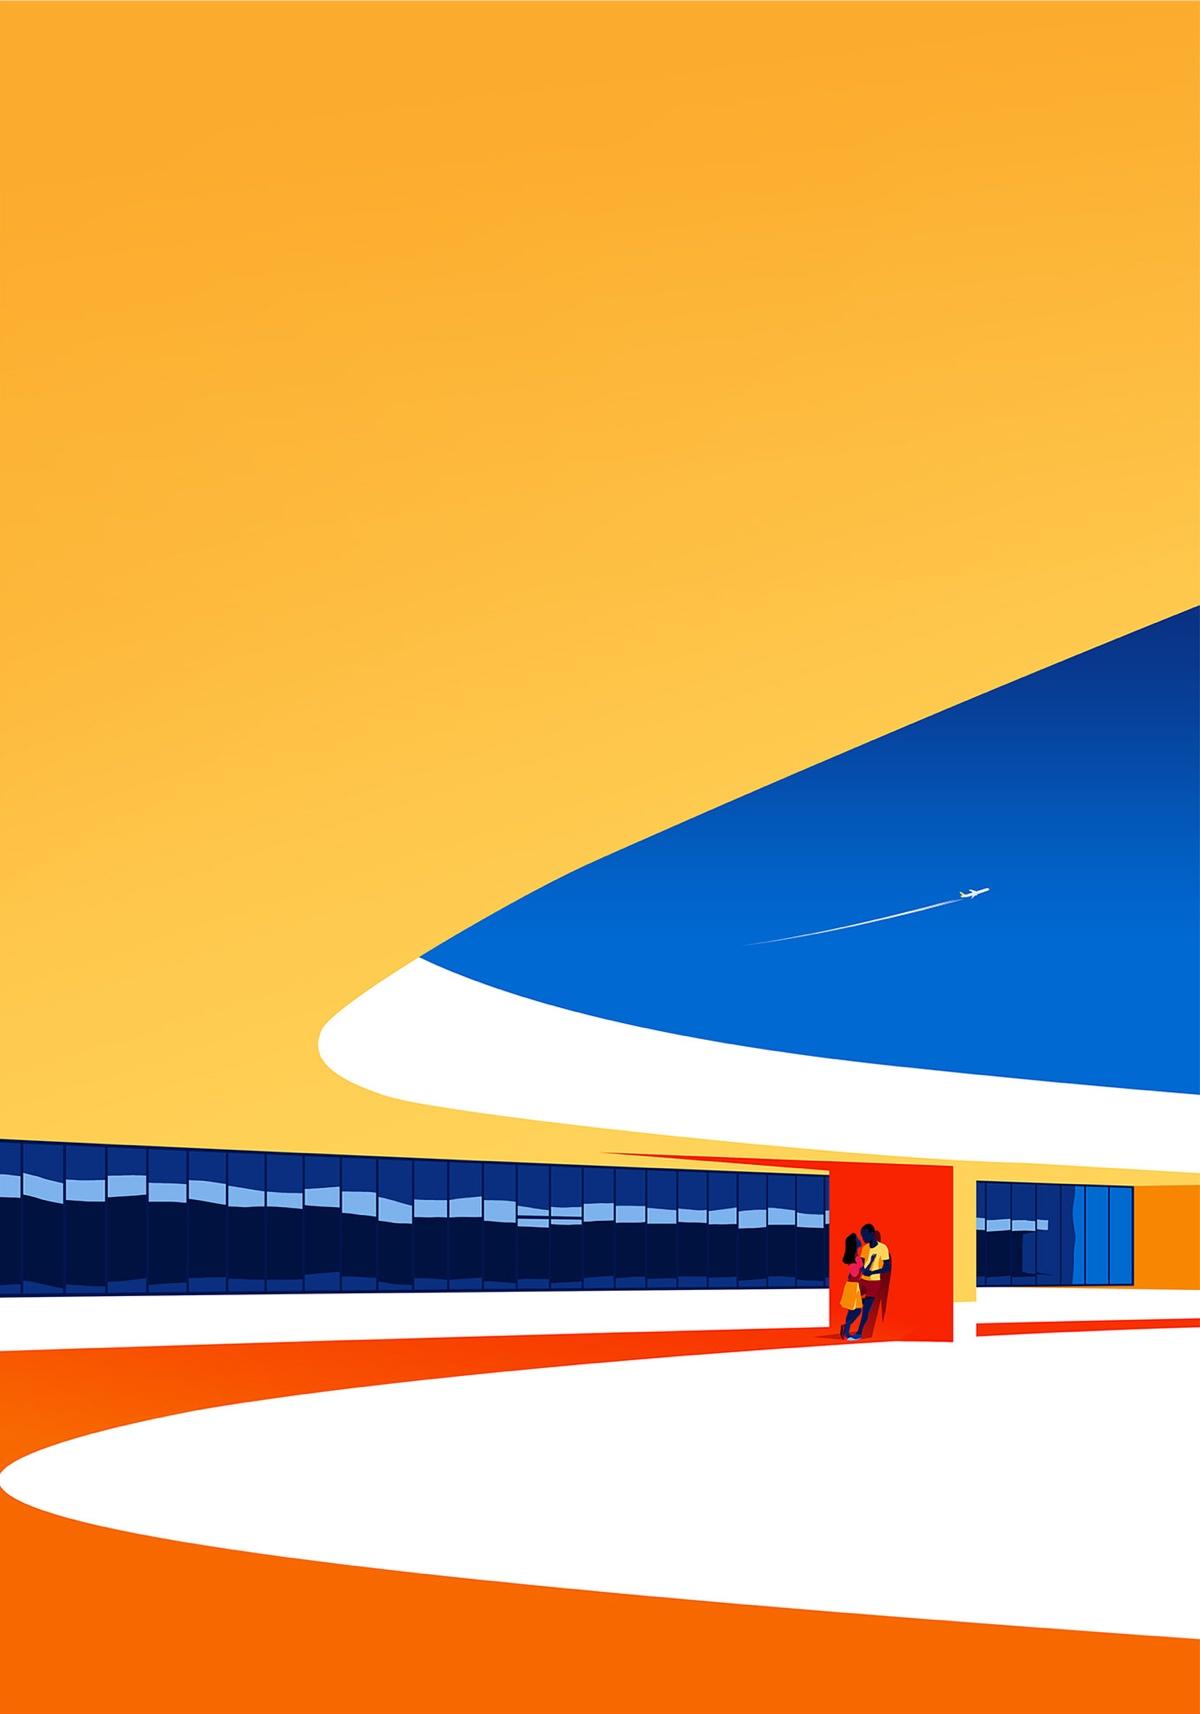 oscar-niemeyer-architecture-illustrations-levente-szabo-7